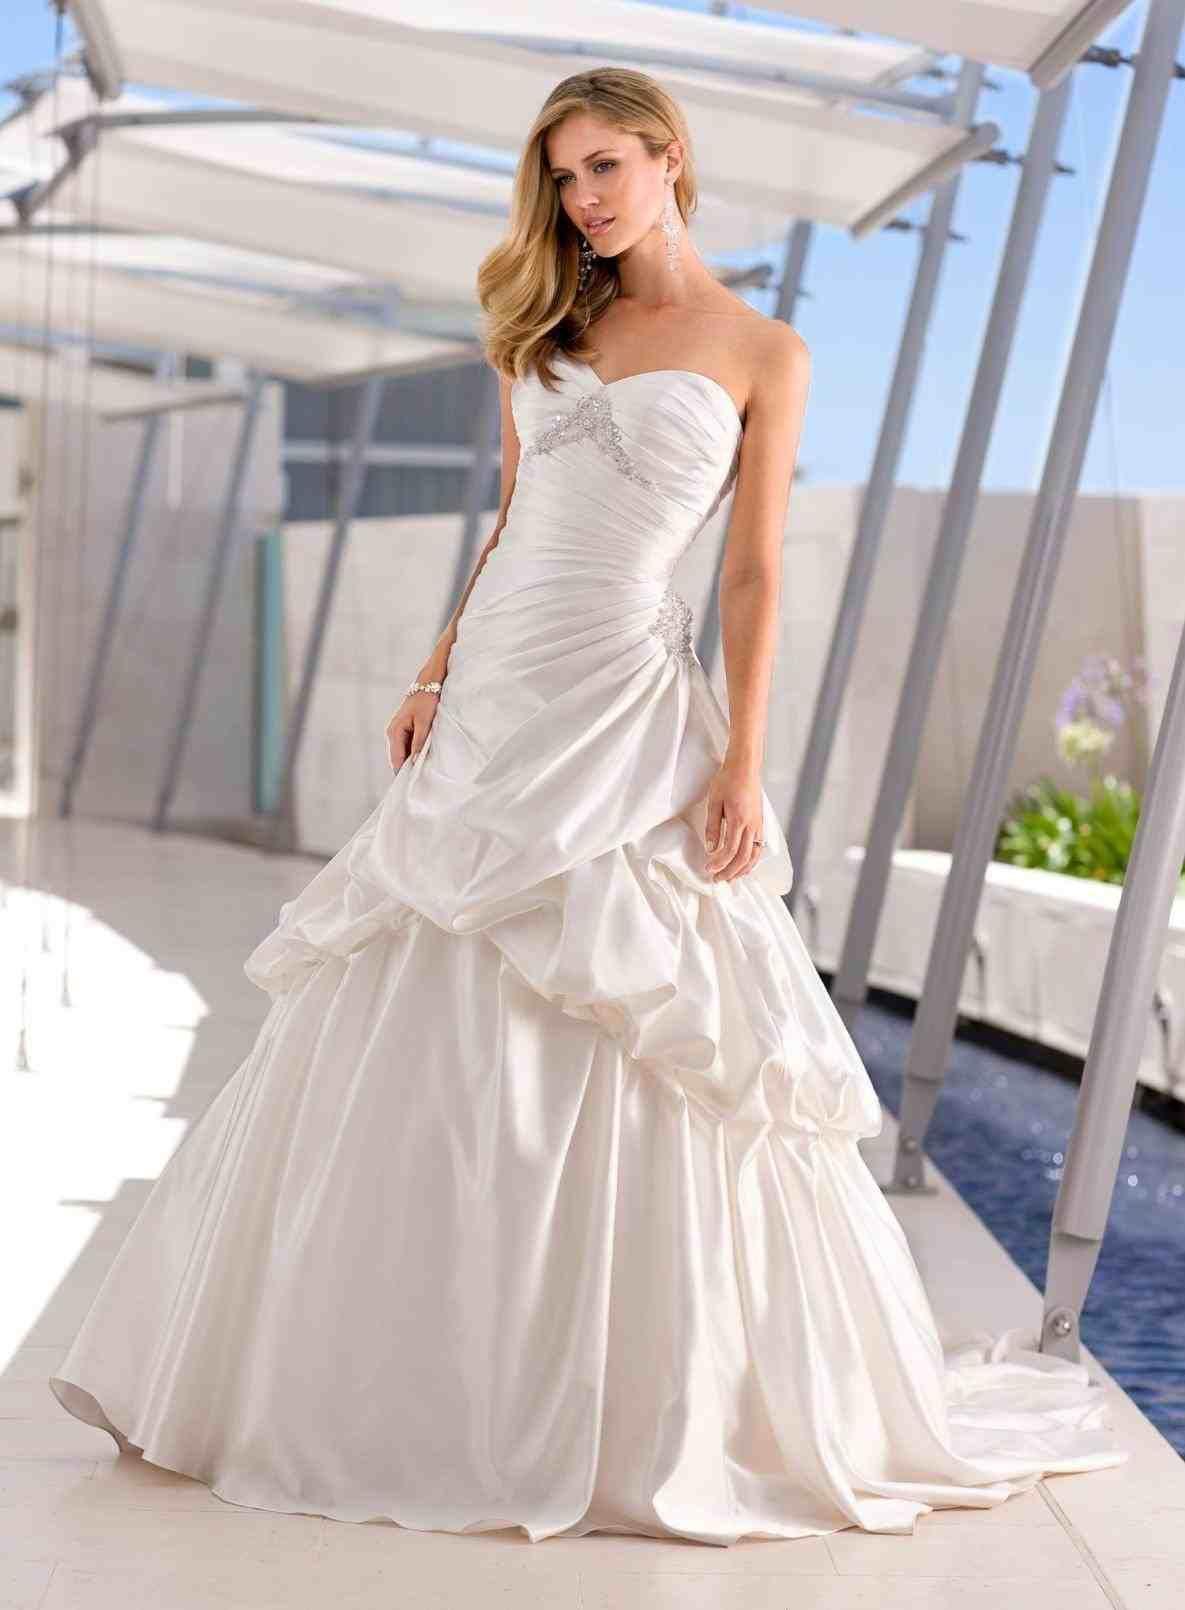 e21afa414ea TOP +10 New post wedding dresses to buy visit wedbridal.site